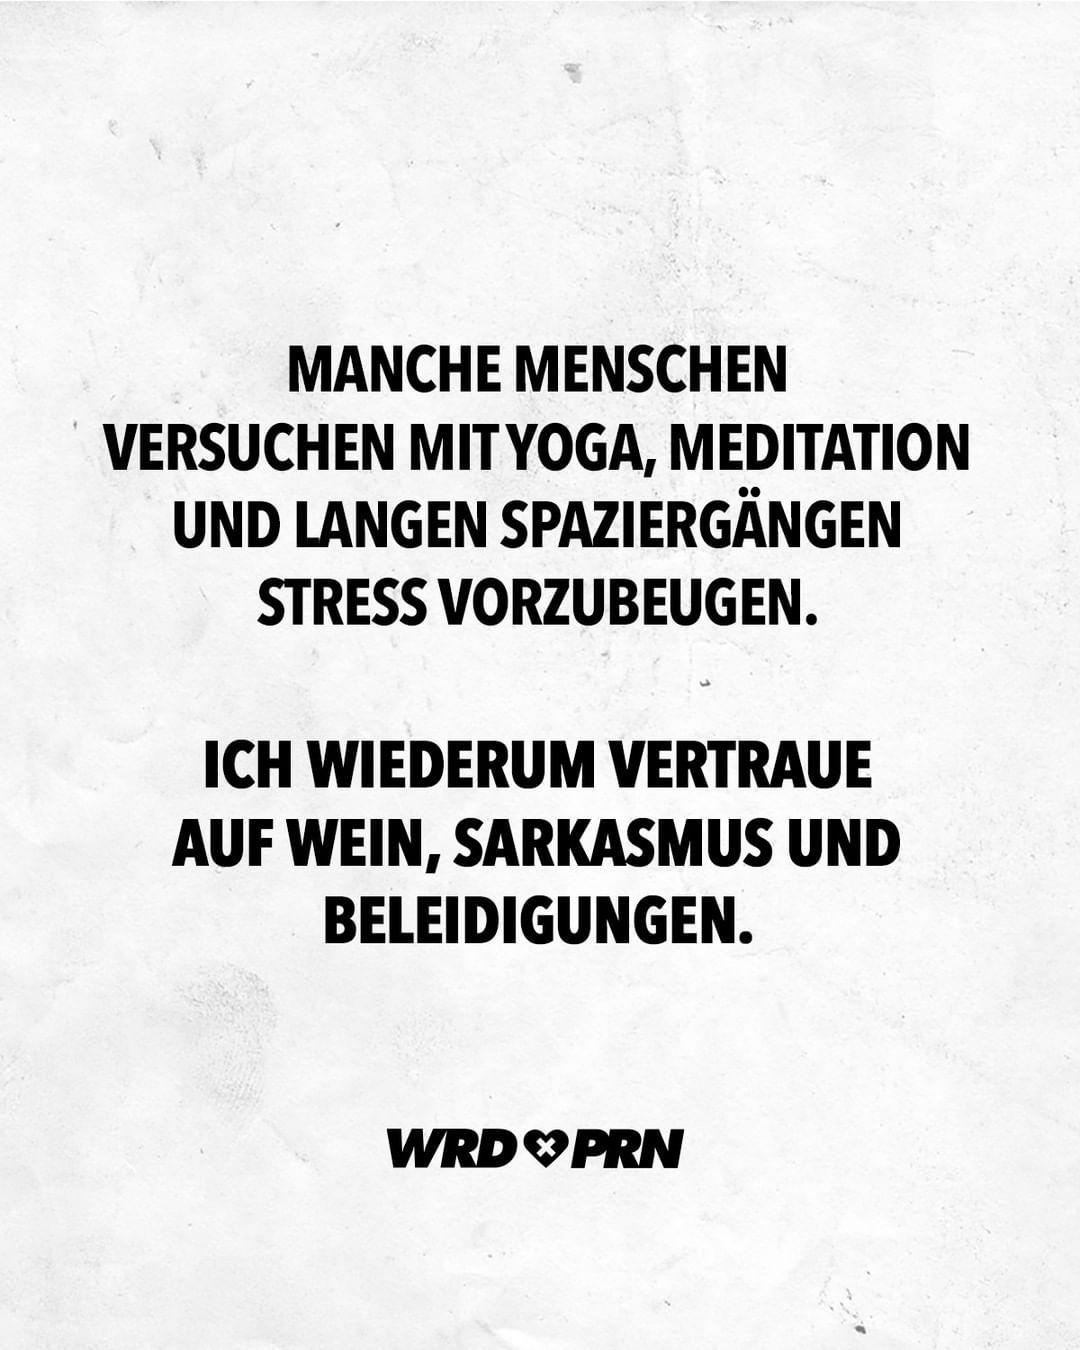 wordporn.® on Instagram: Beste Strategie 😁 #